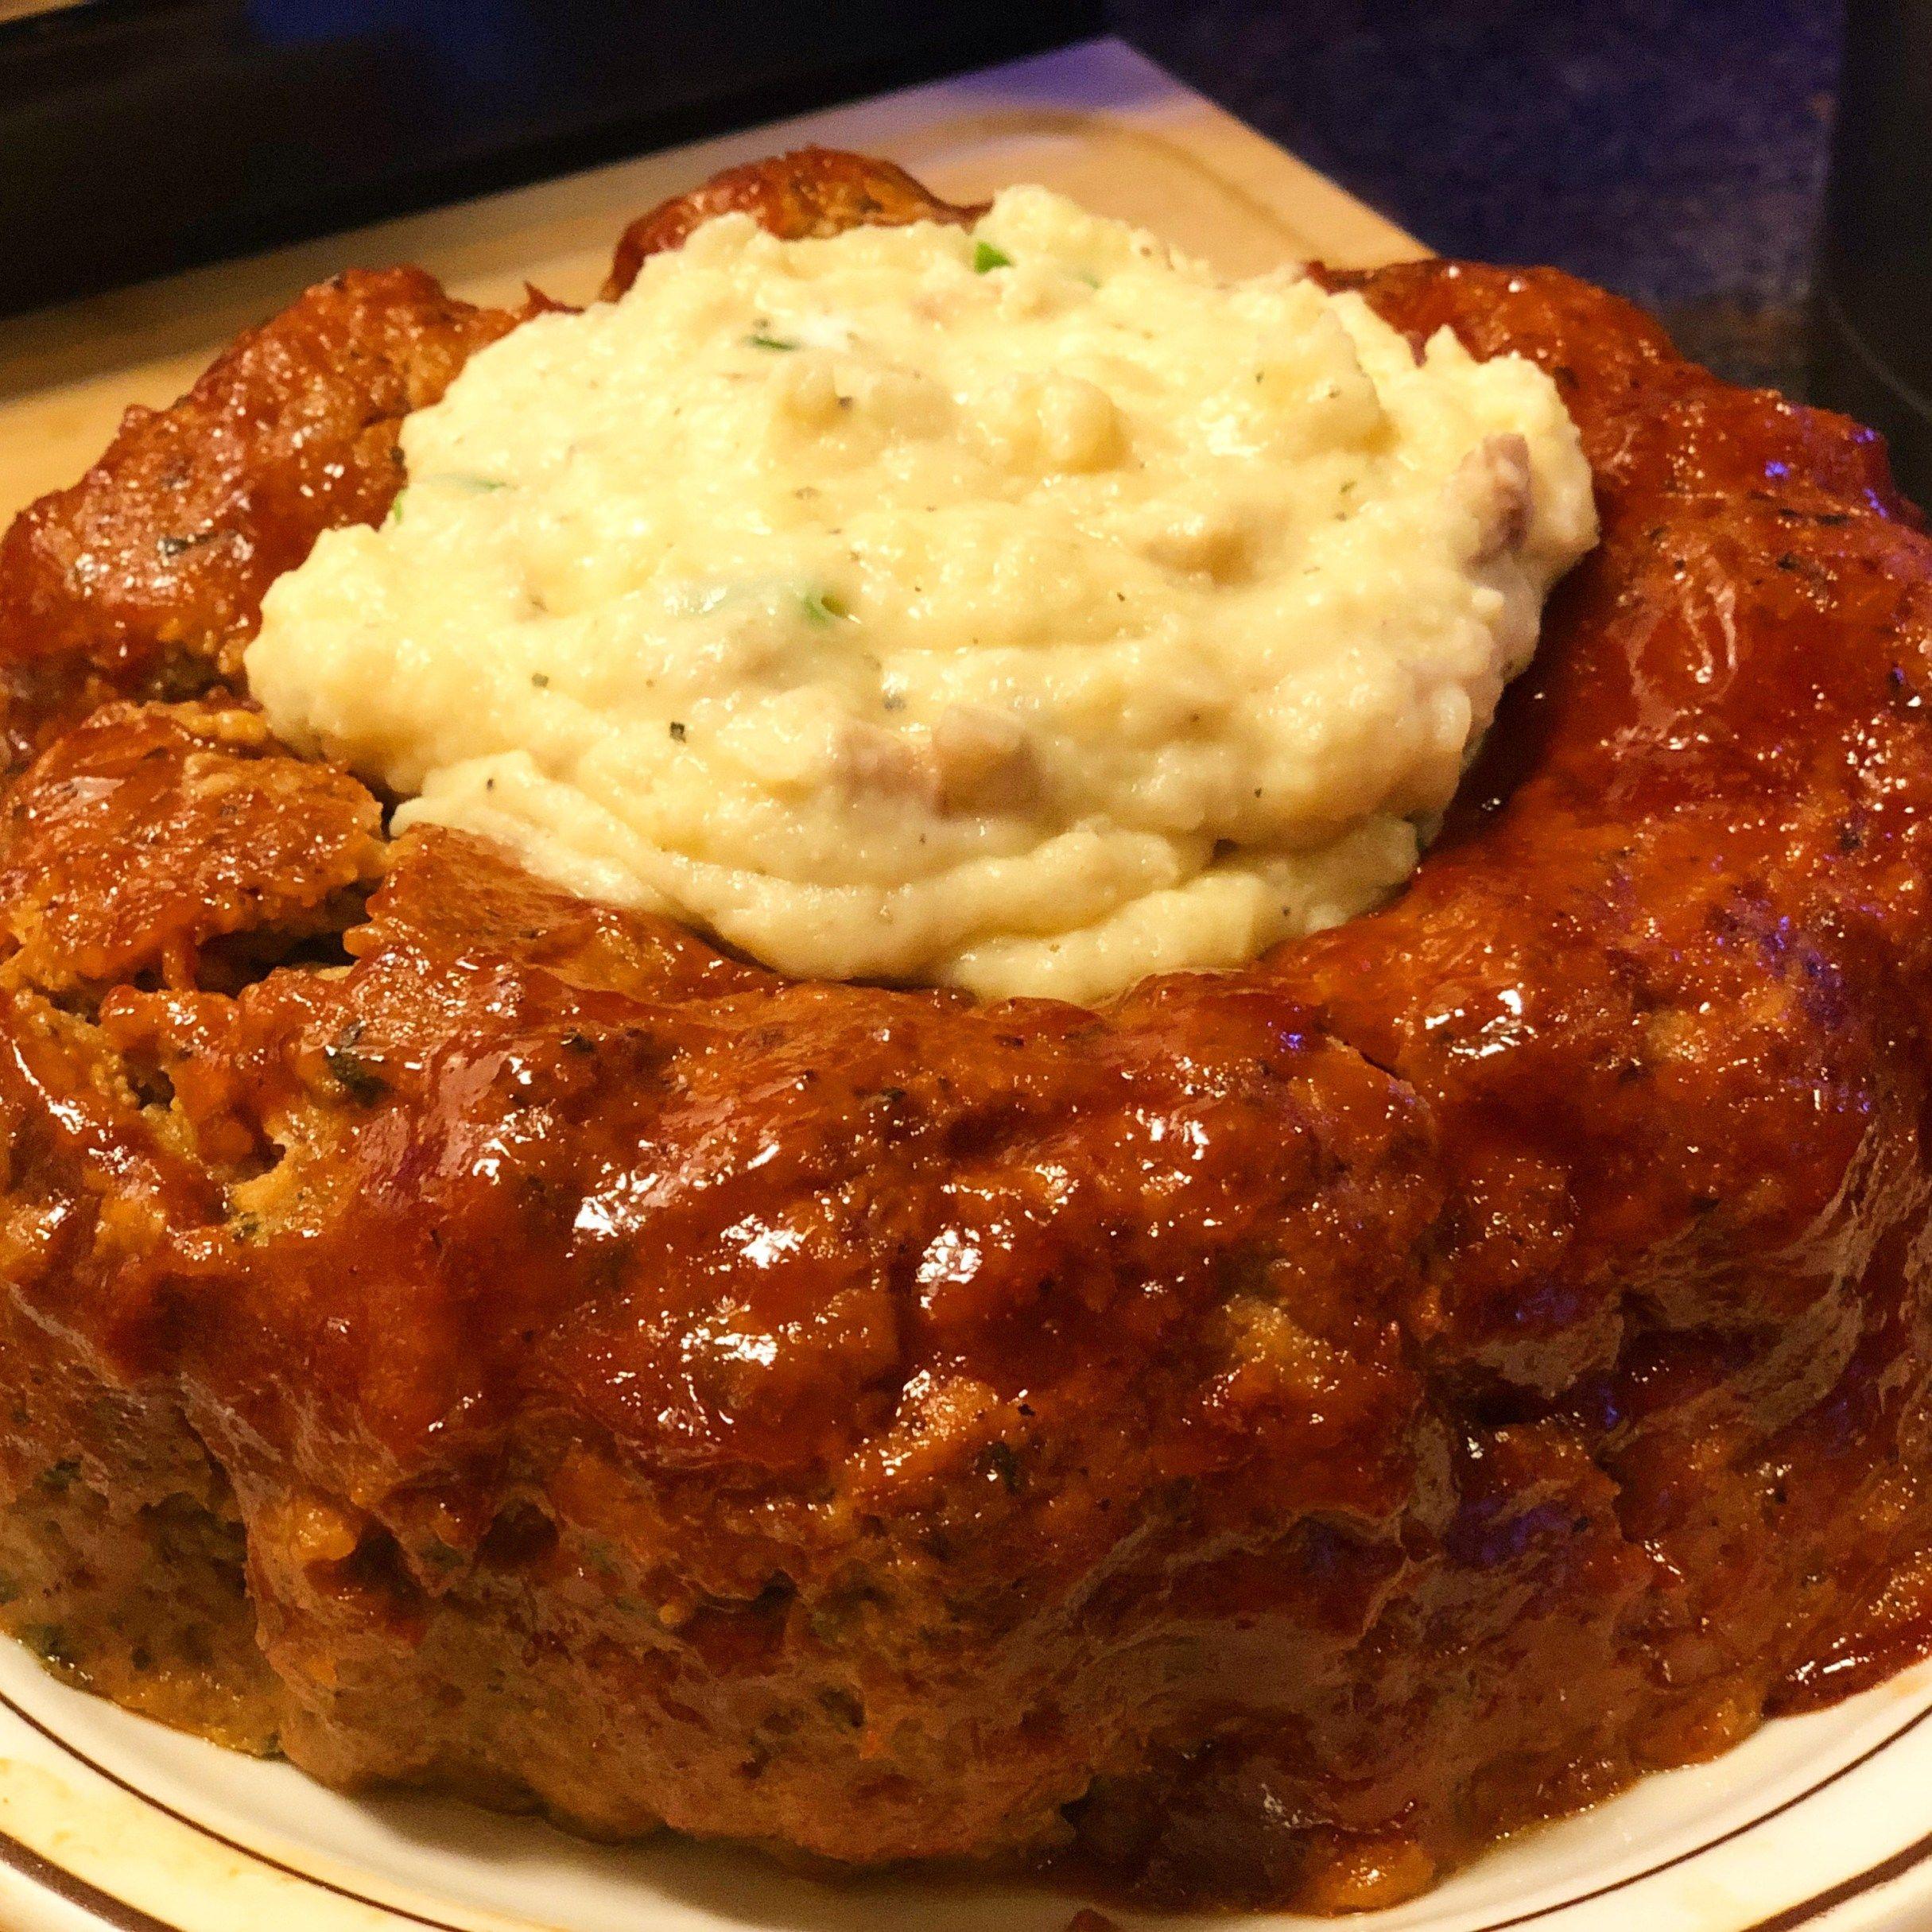 Instant Pot Best Meatloaf Mashed Potatoes Pressure Luck Cooking Recipe Best Meatloaf Recipes Instant Pot Recipes